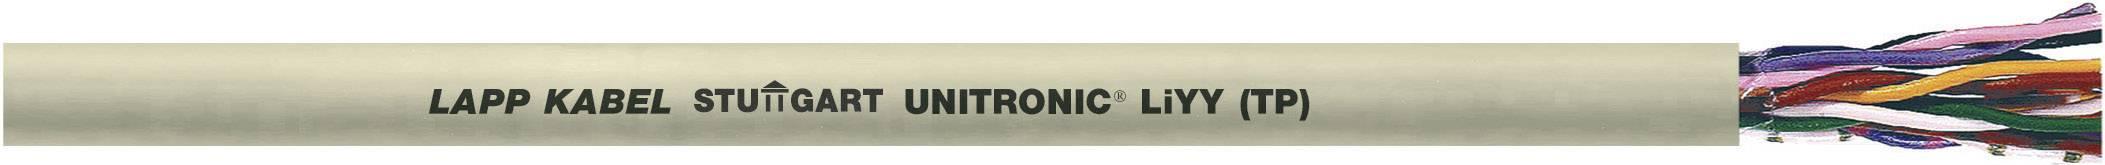 Datový kabel UNITRONIC LIYY TP 4x2x0,14